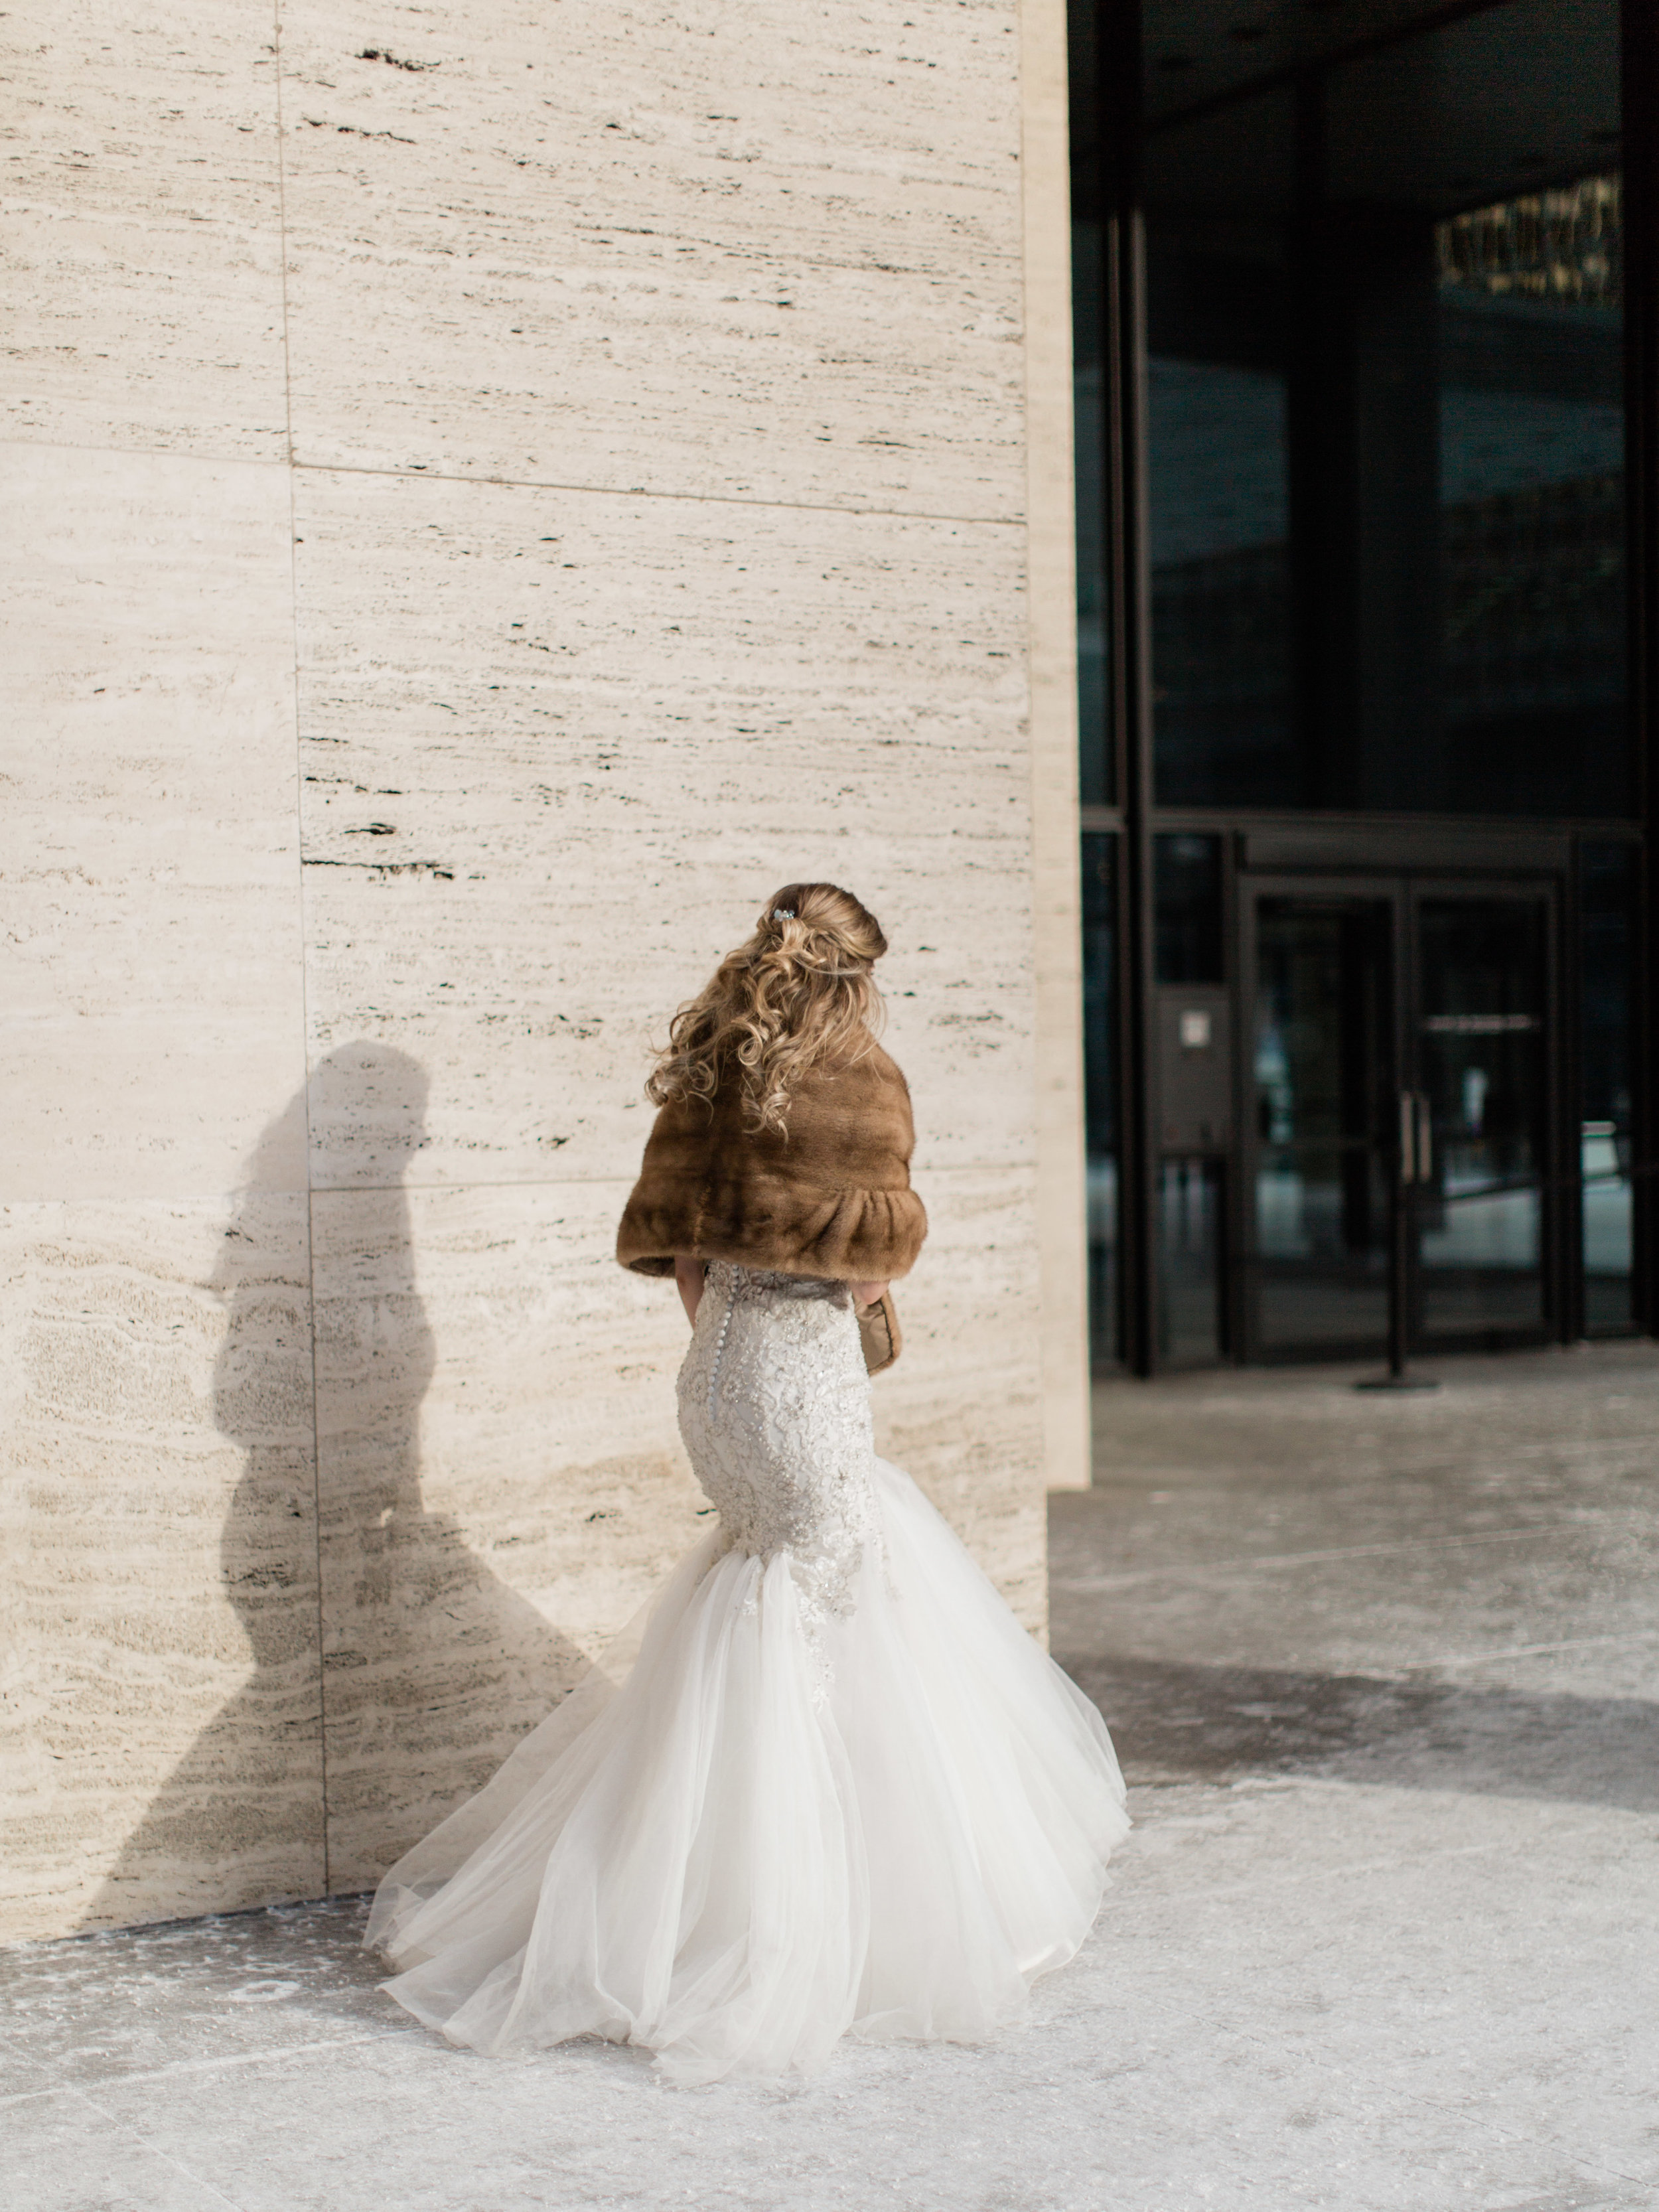 Toronto-wedding-photographer-downtown-winter-wedding-intimate-restaurant-canoe106.jpg